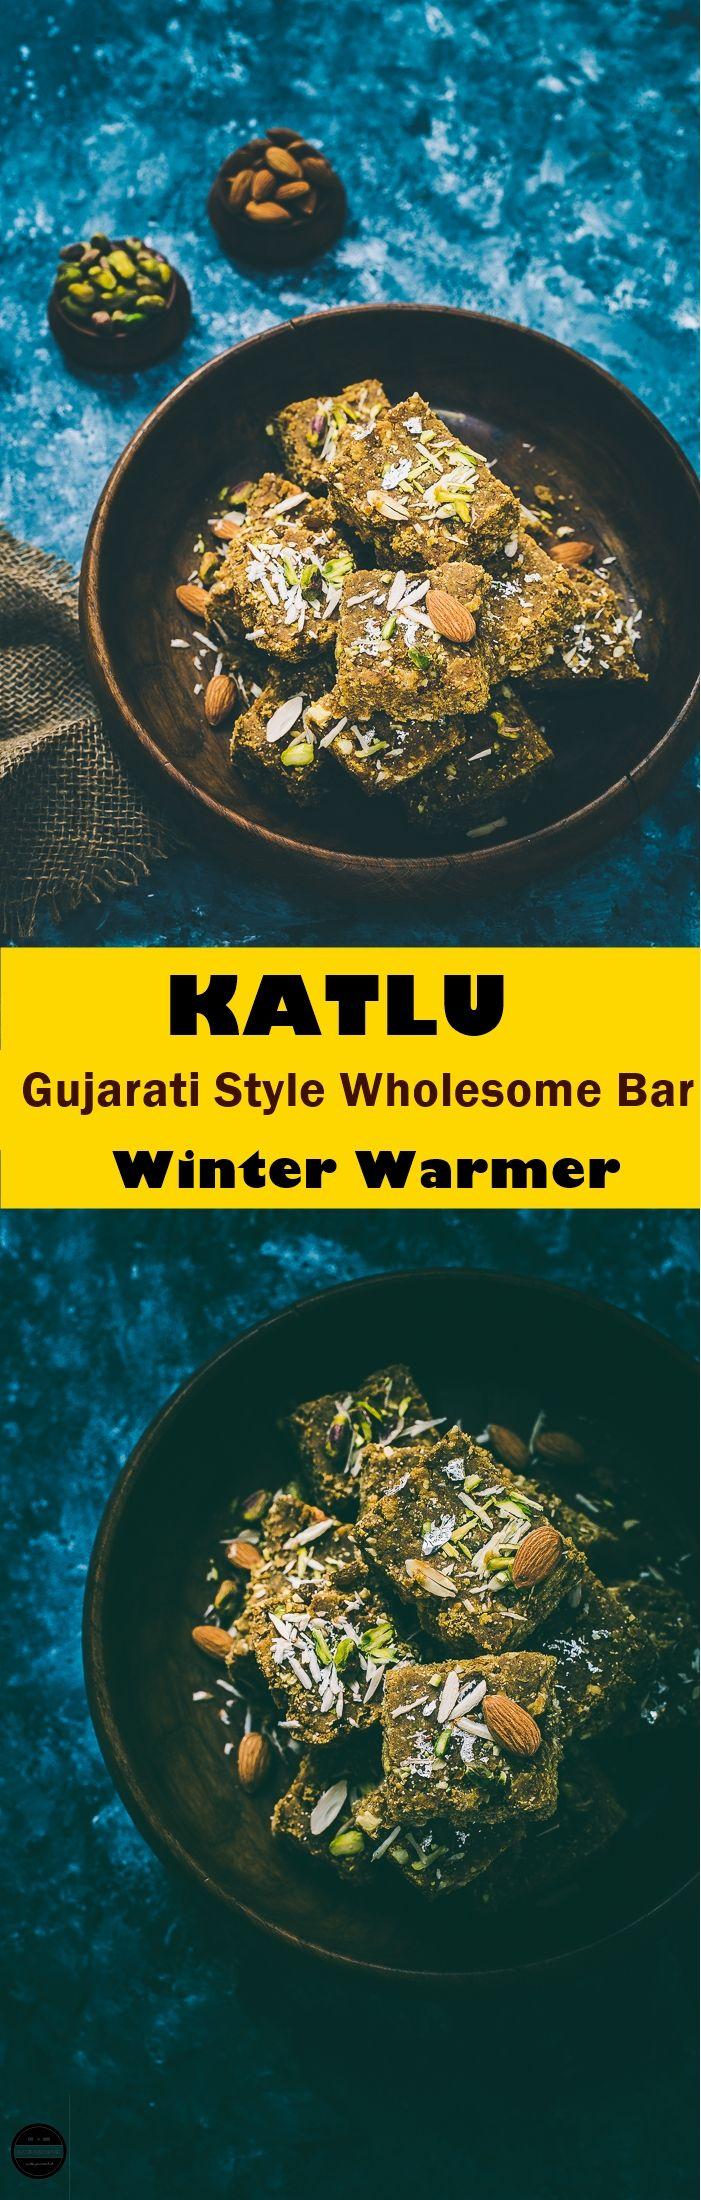 Katlu-Gujarati style winter warmer wholesome bar!